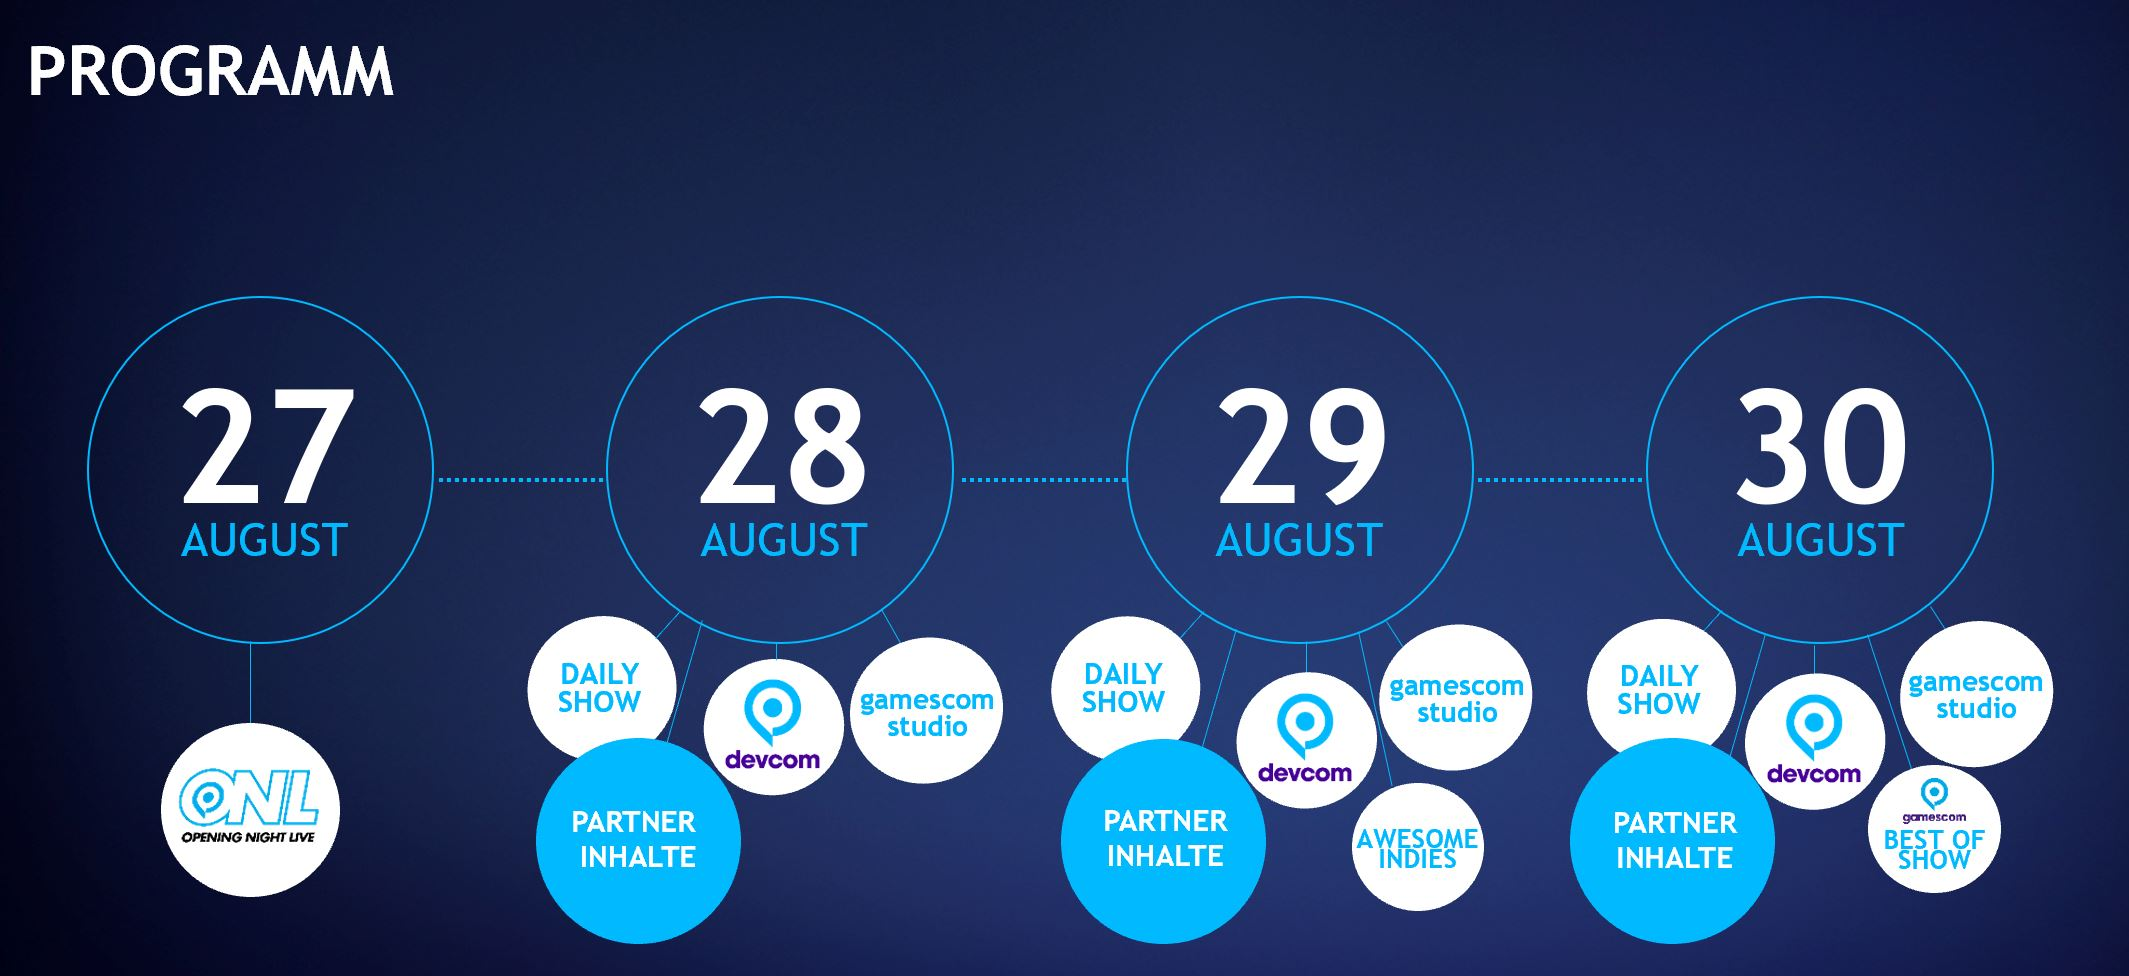 gamescom experience 2020 : Programme